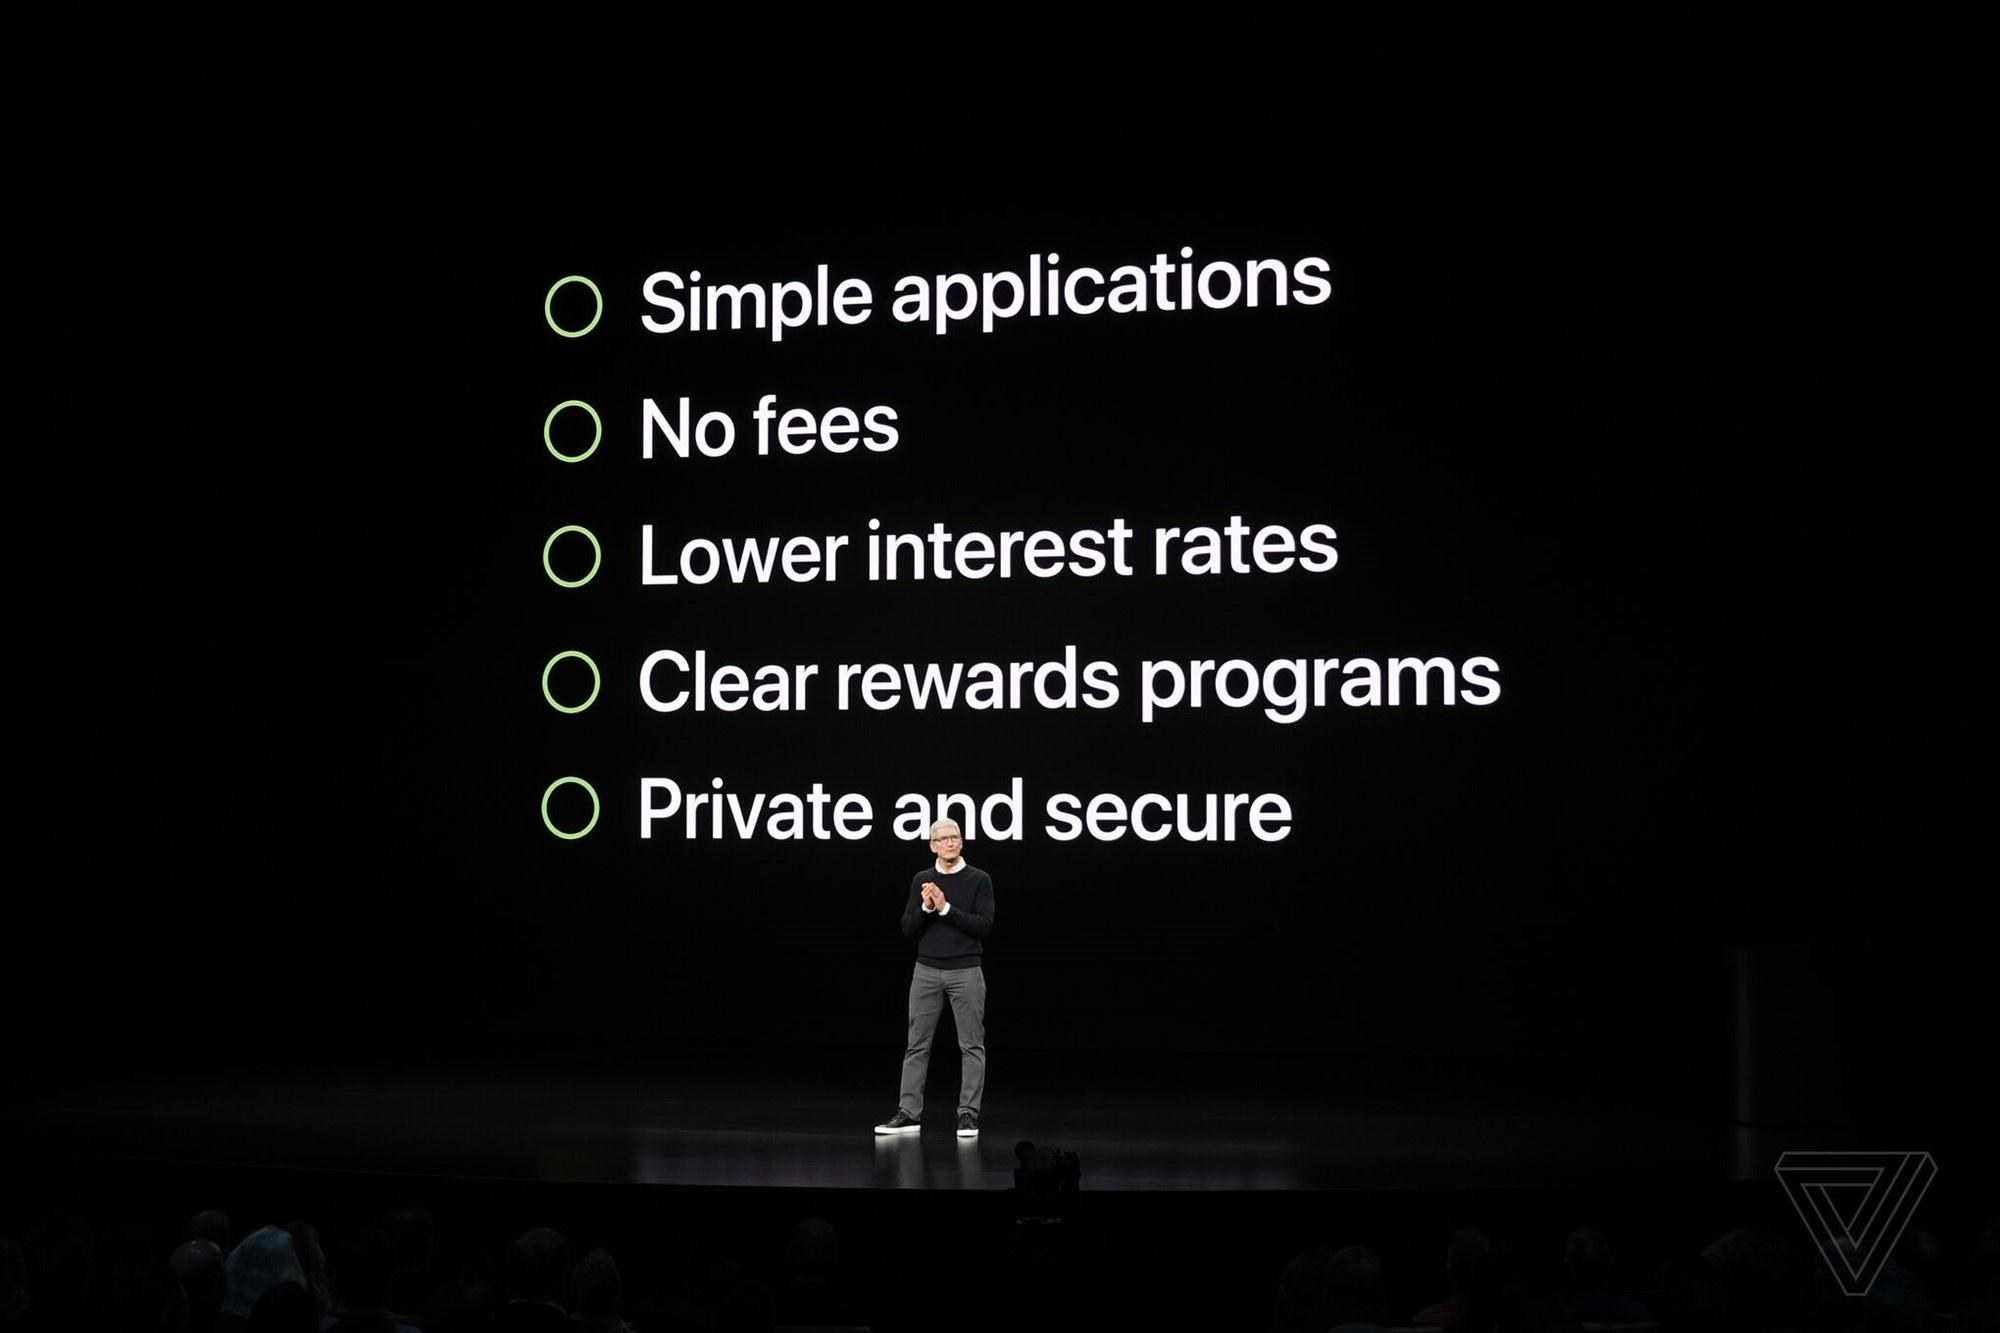 Прямой эфир: Apple News+, Apple Card, Apple Arcade, Apple TV Channels и Apple TV+